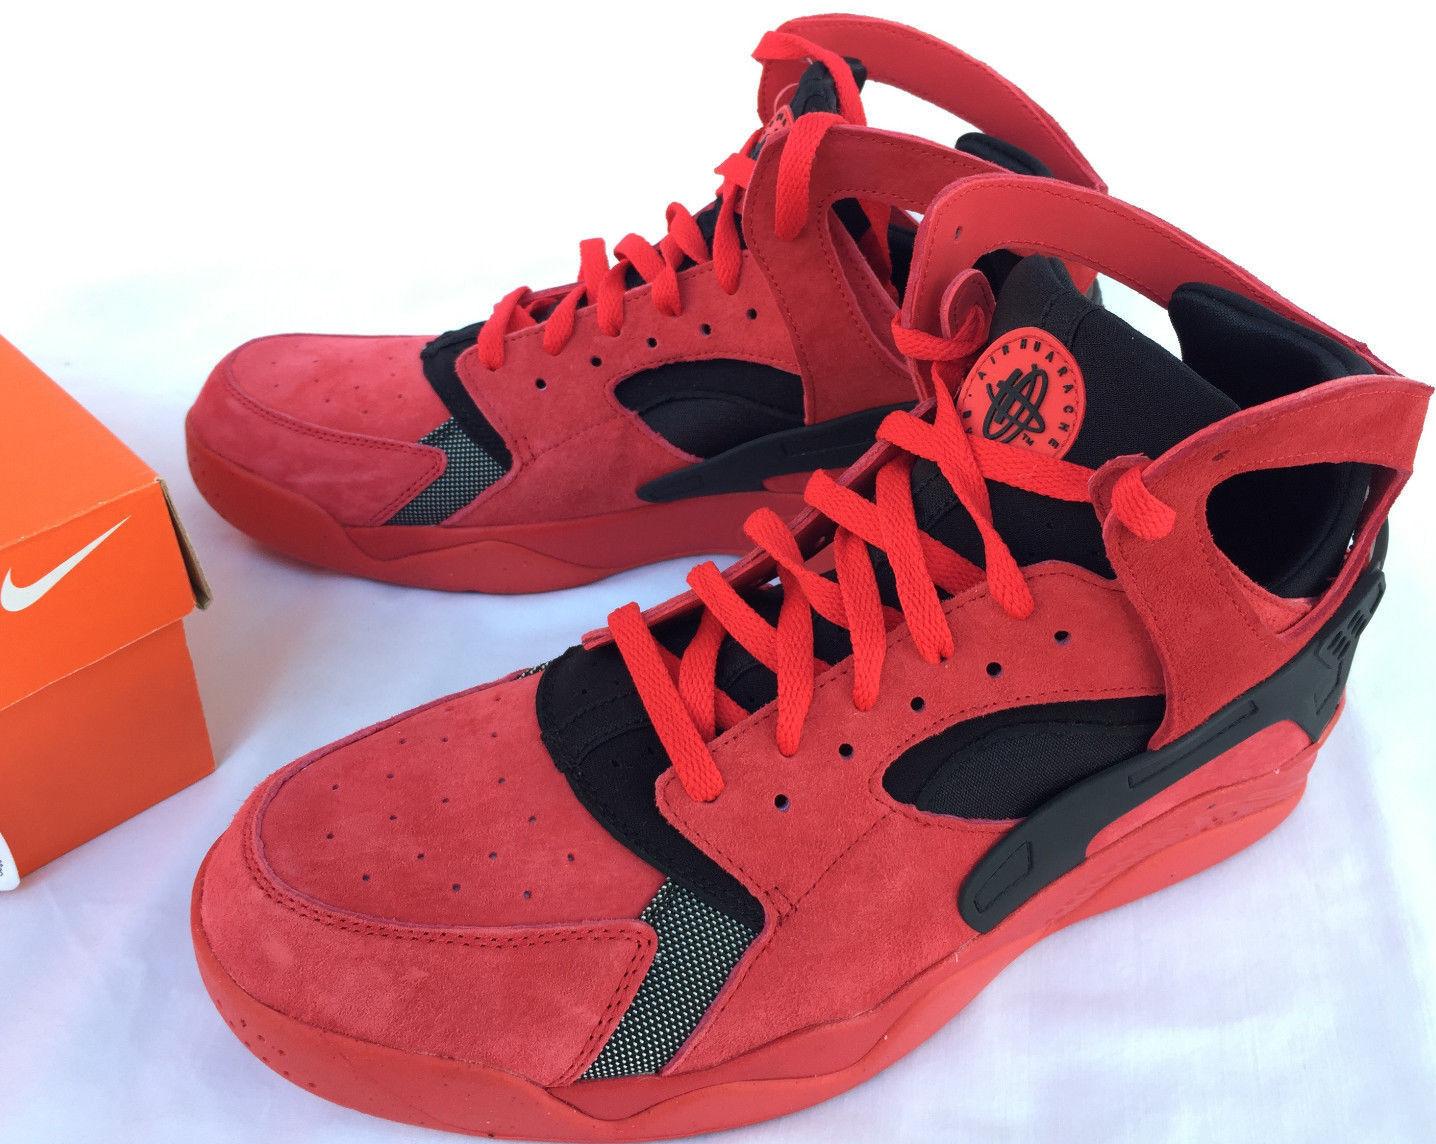 Nike Red Air Flight Huarache 705005-600 Red Nike Love Hate Pack Basketball Shoes Men's 9 4f9b27